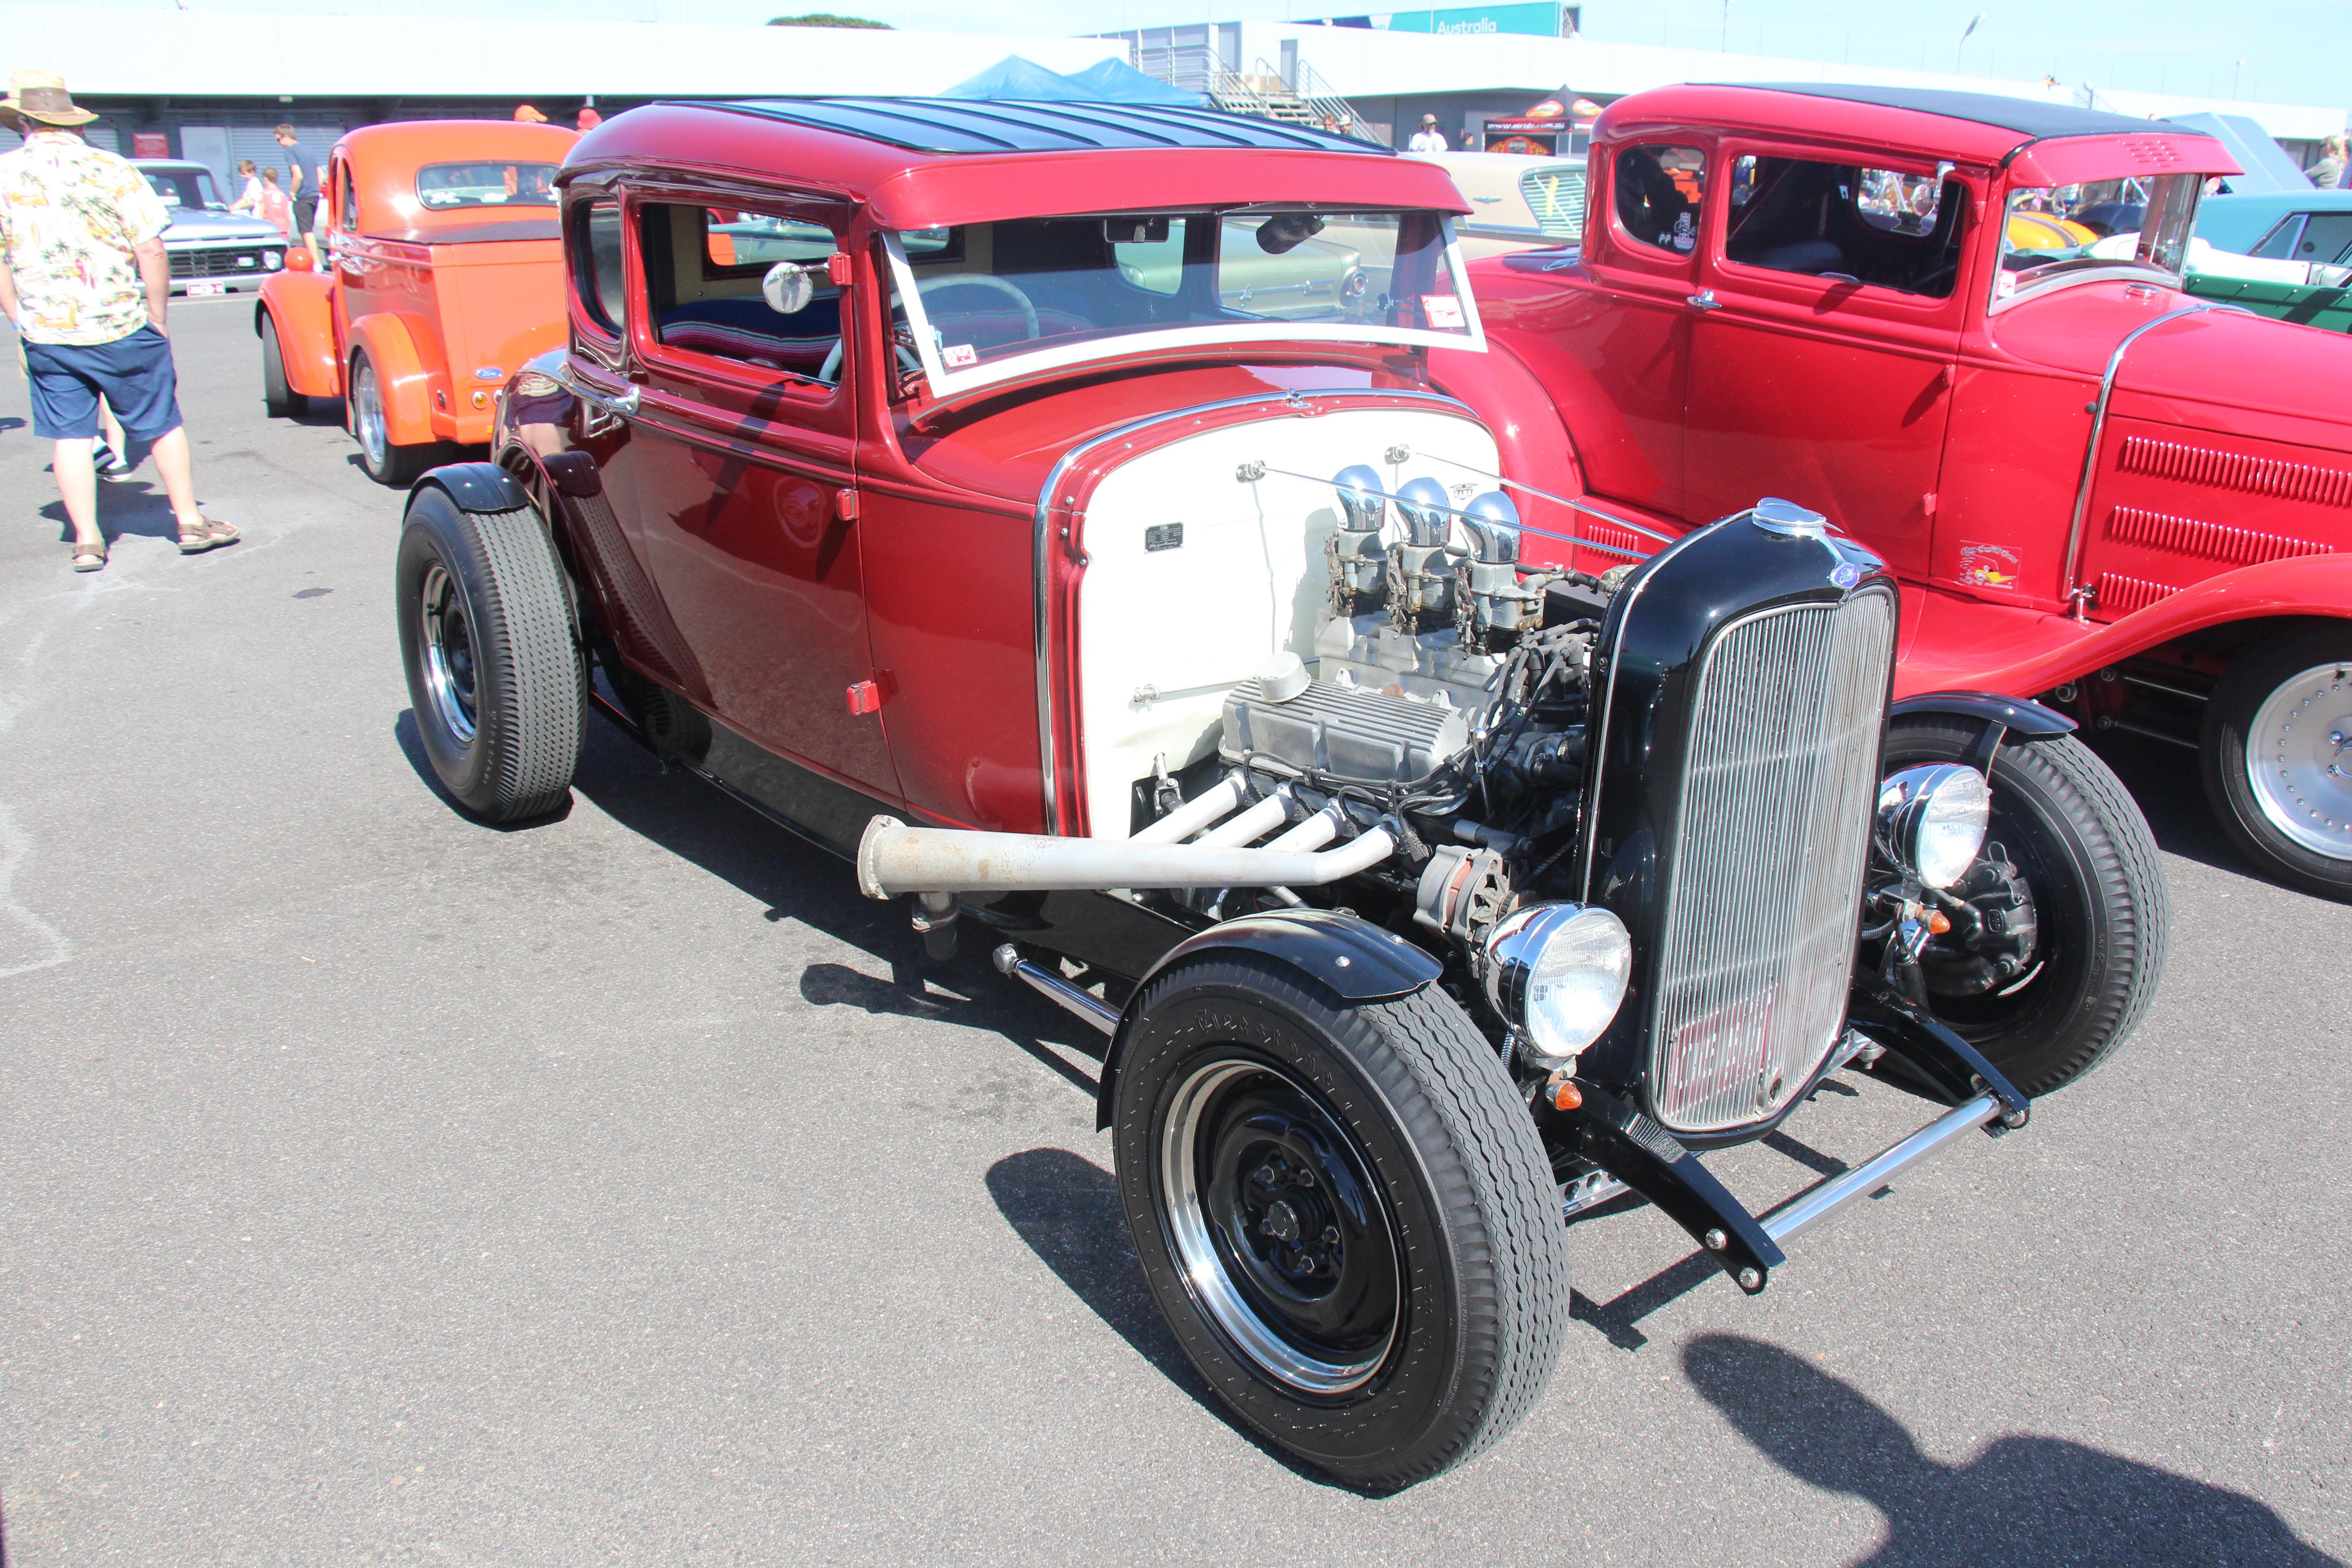 File:1930 Ford Model A Coupe Hot Rod (23779596114).jpg - Wikimedia ...